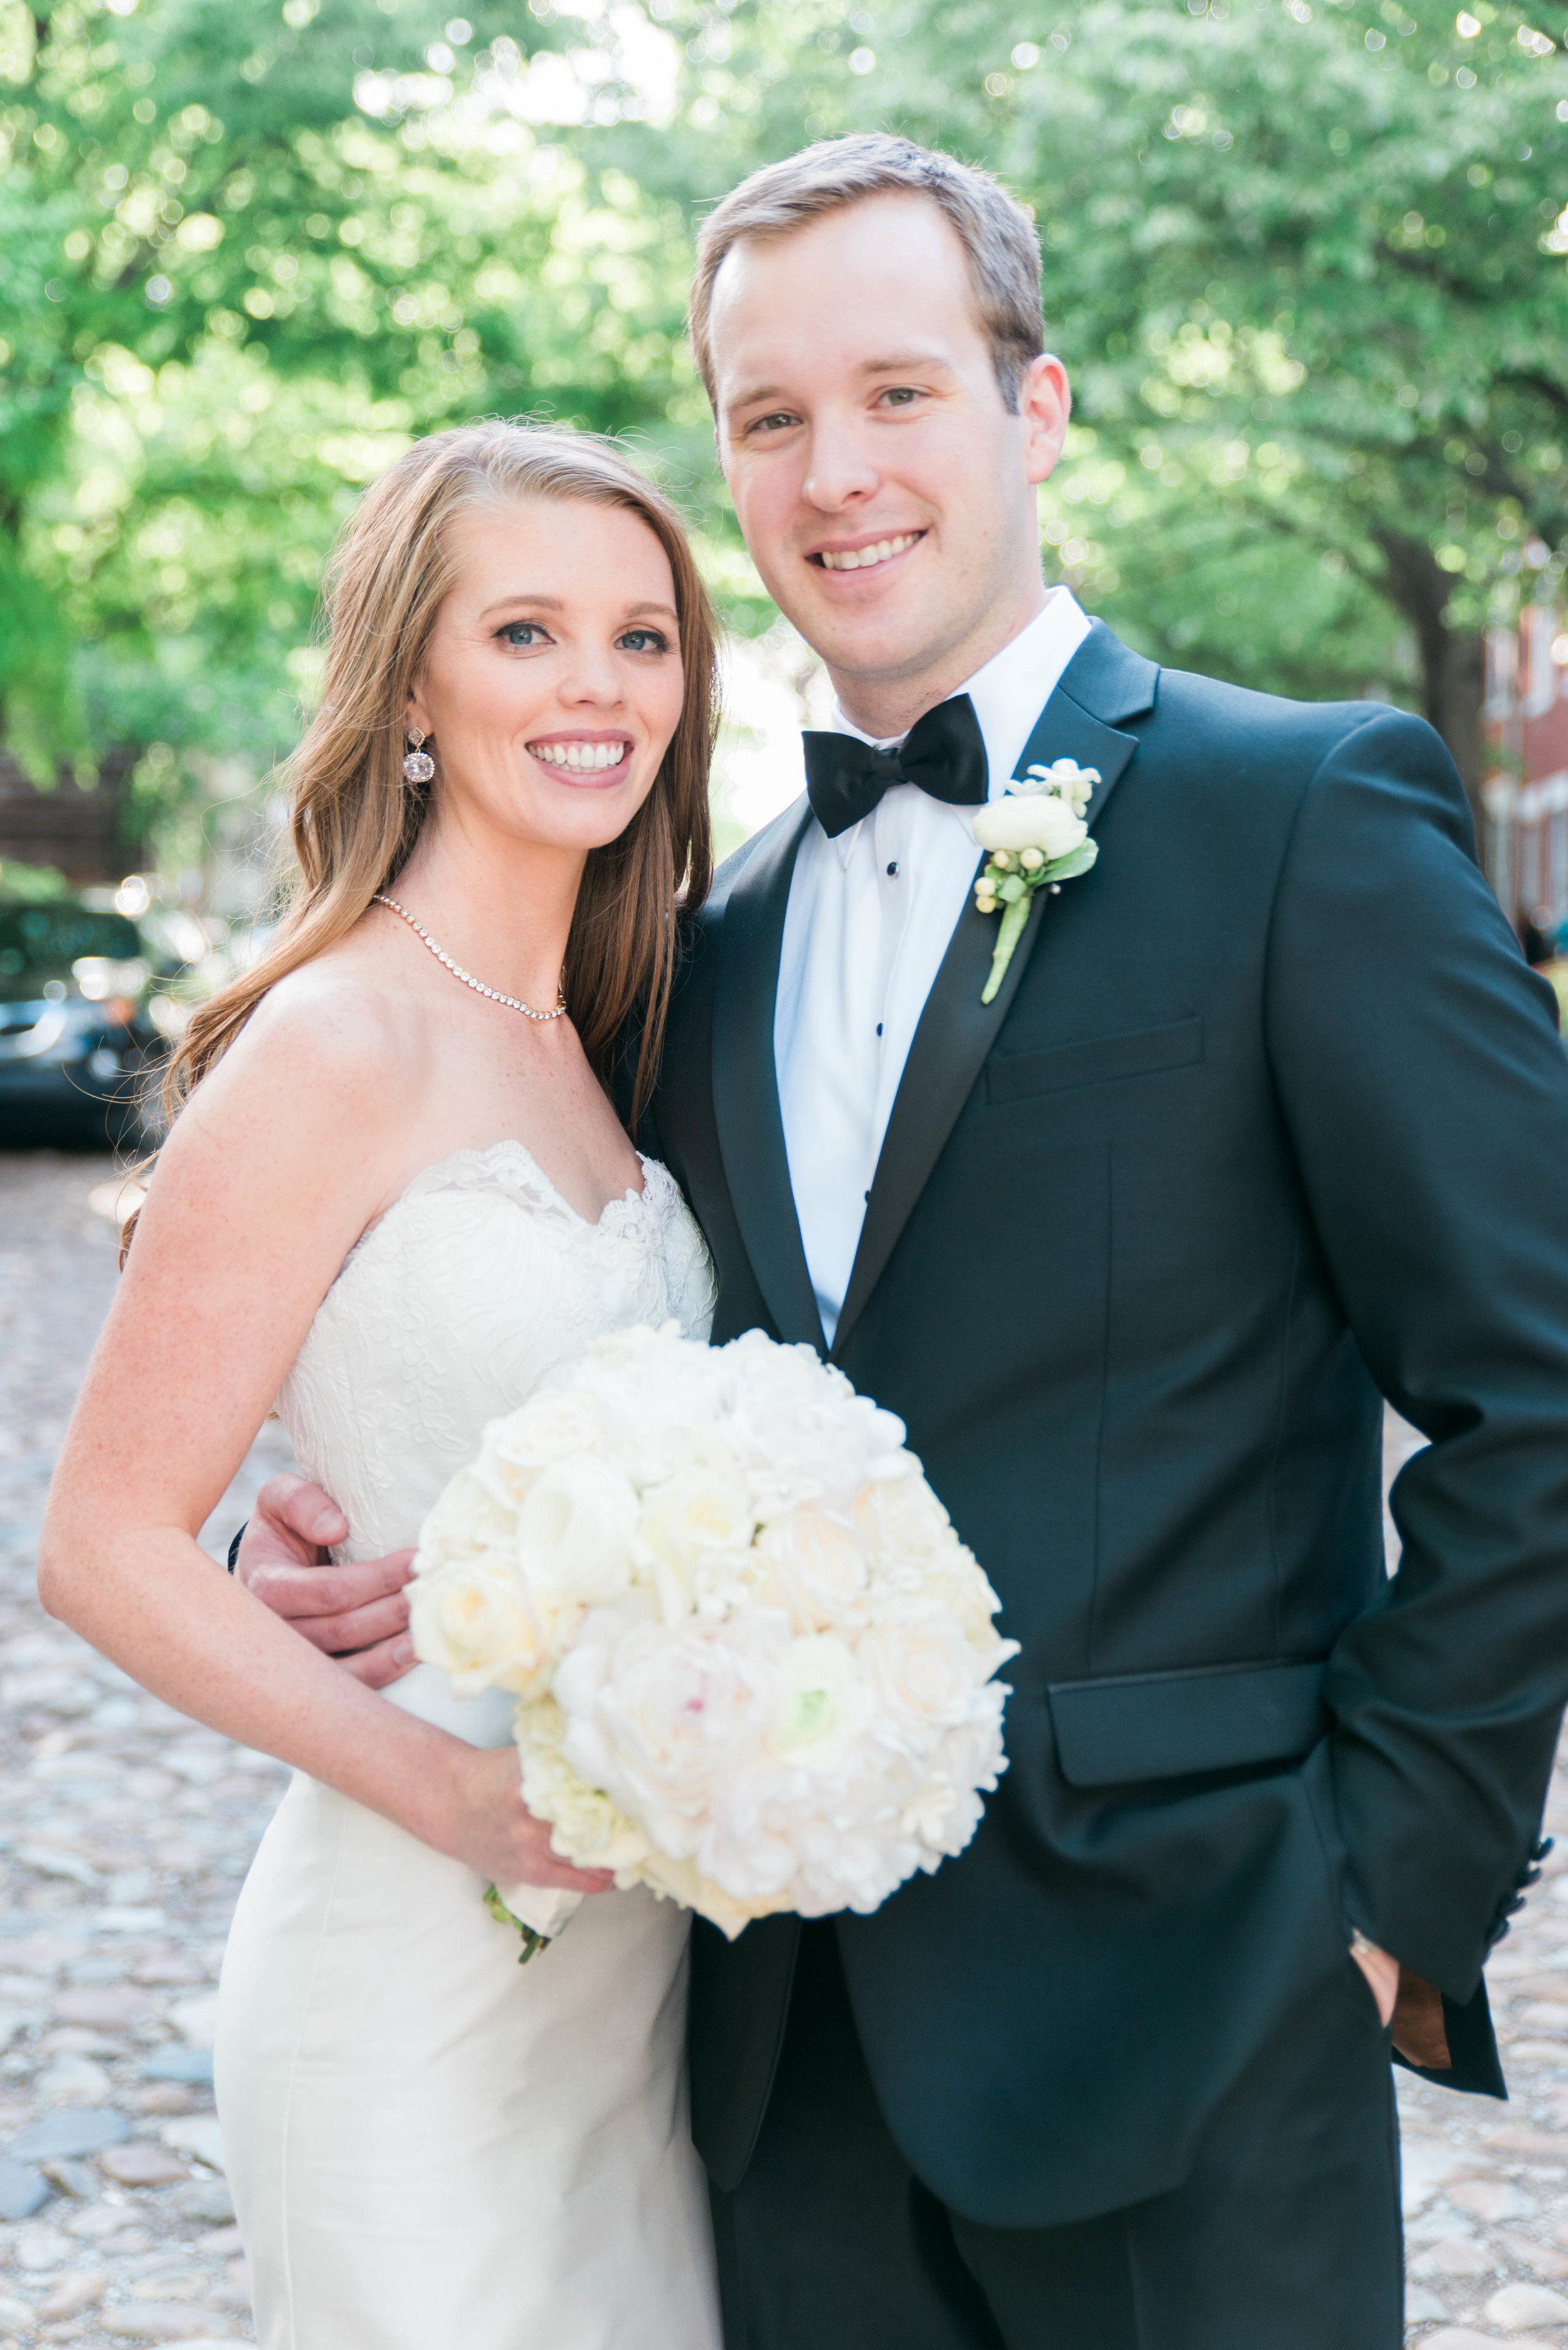 Kathleen&Ryan_BeccaBPhotography_Portraits-72.jpg